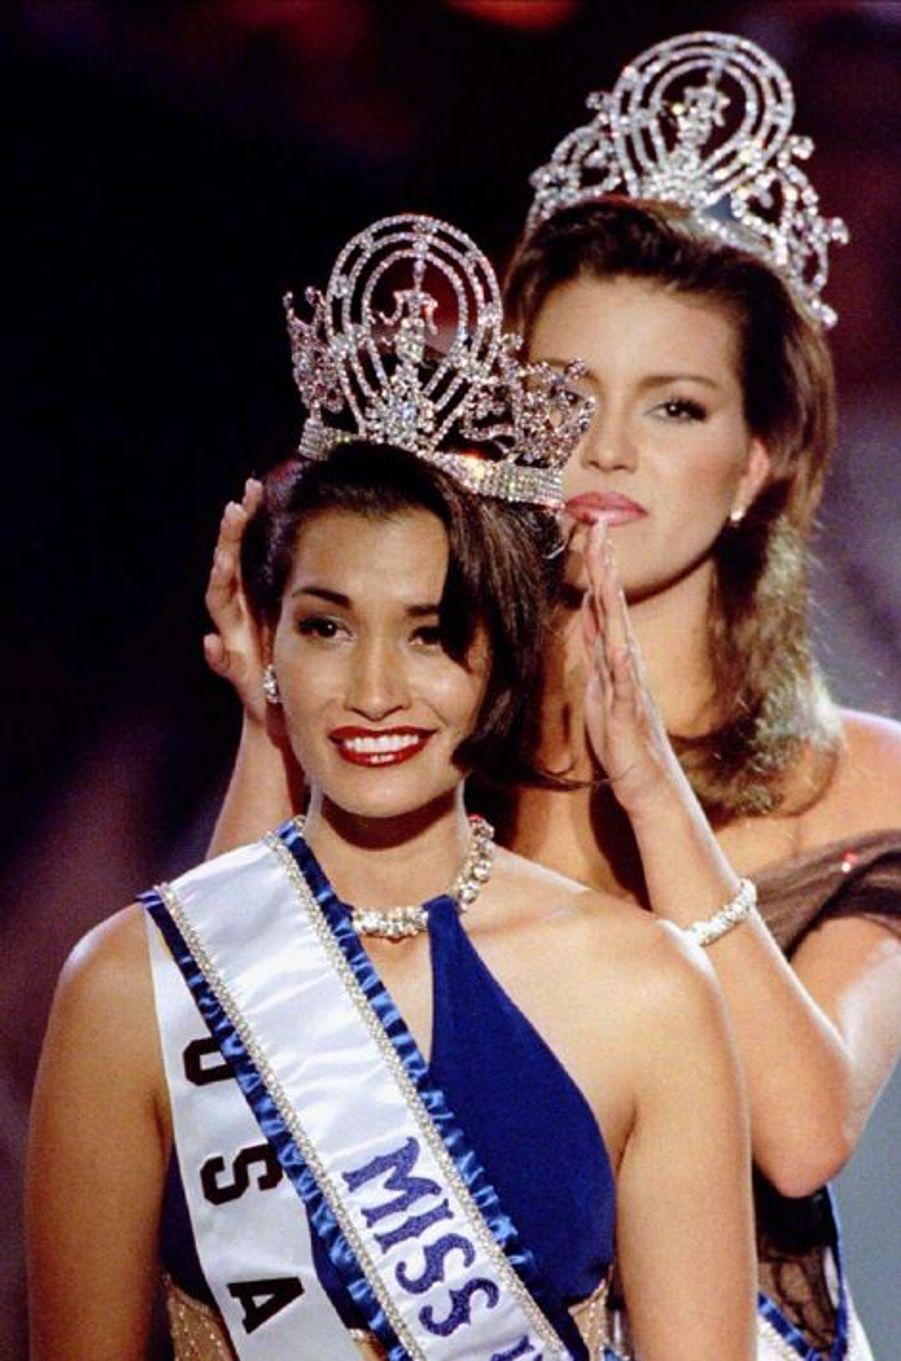 Brook Lee, Miss USA élue Miss Univers en 1997